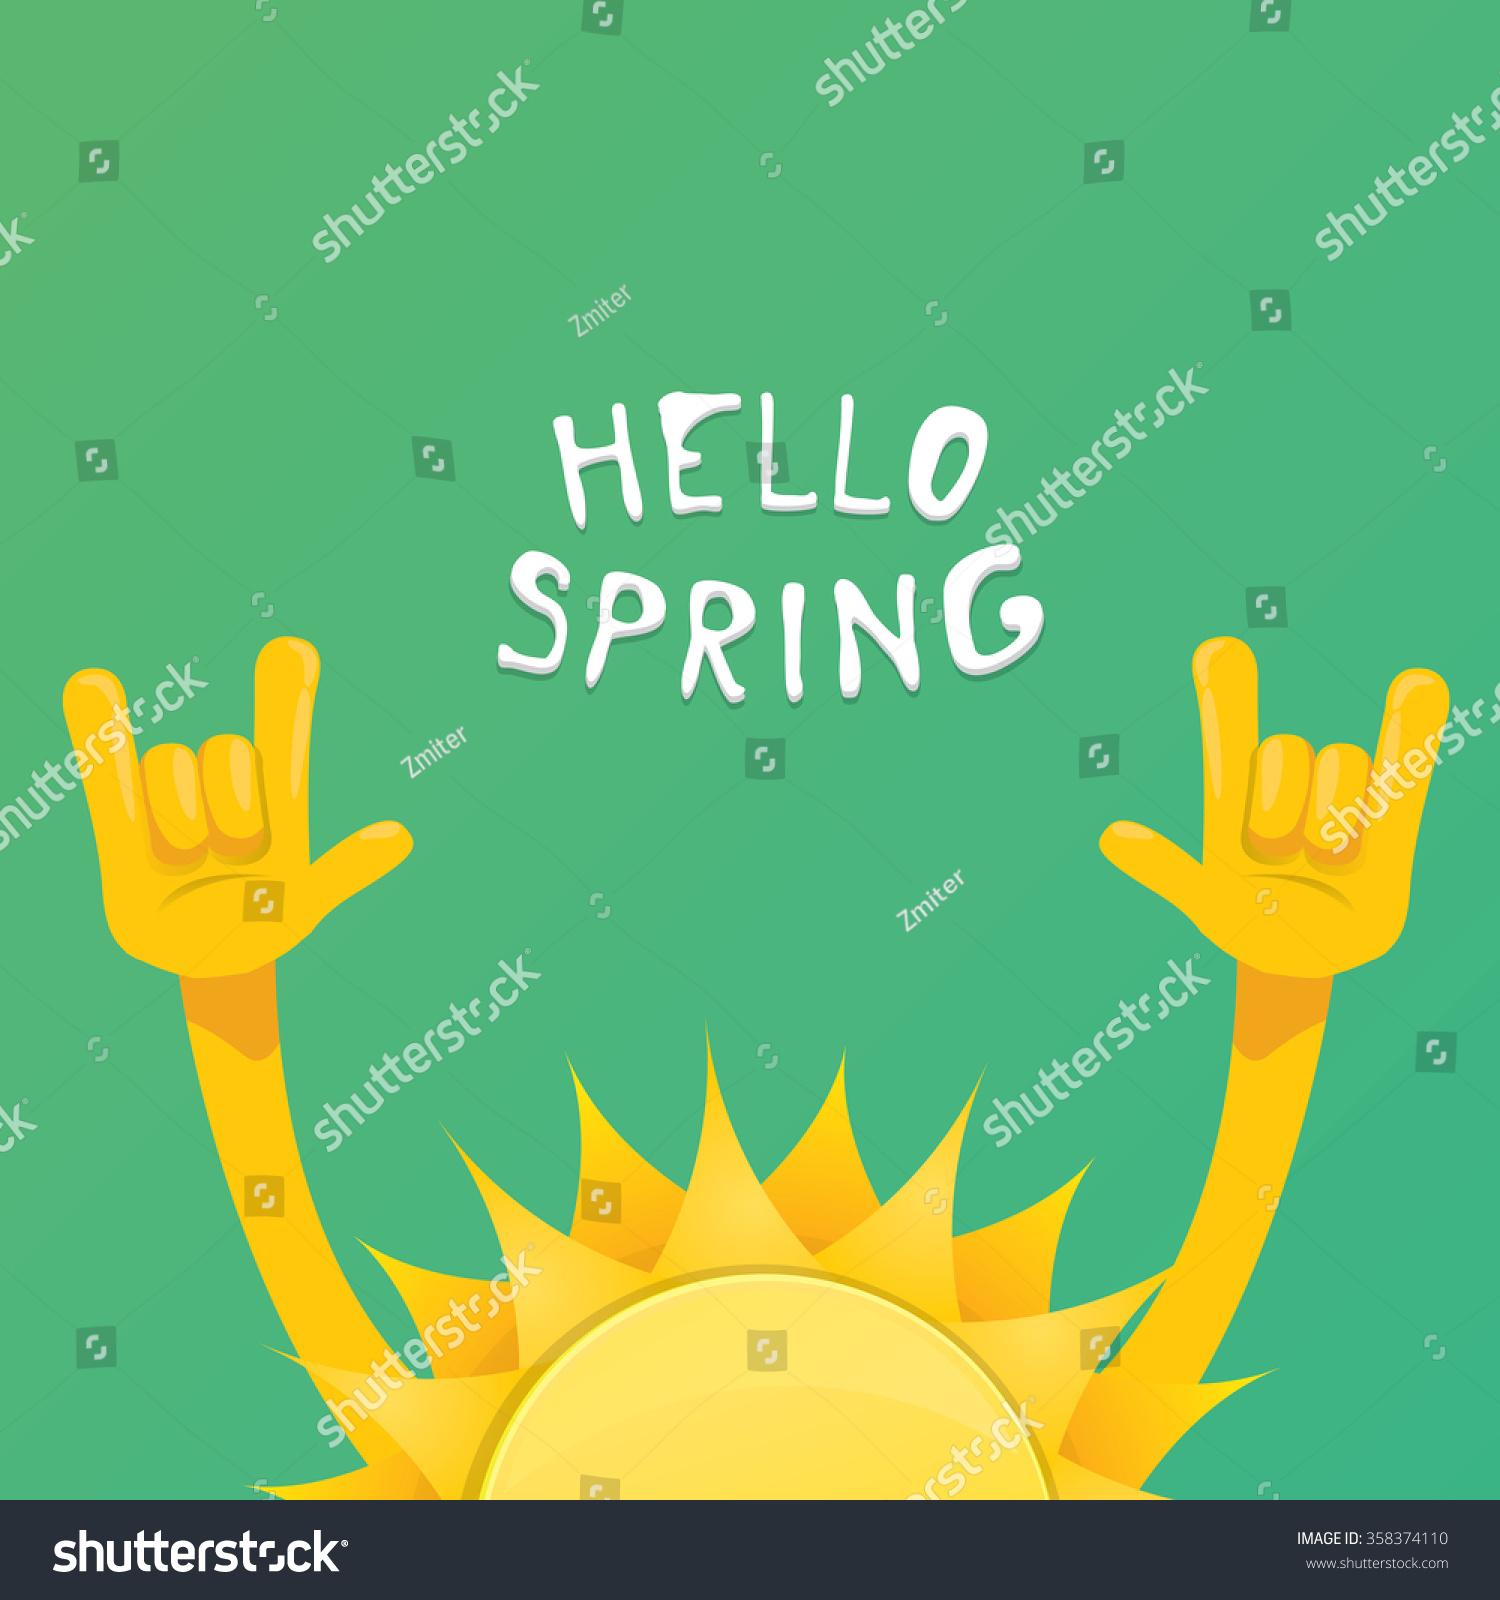 Rock n roll poster design - Sun Hand Rock N Roll Icon Vector Illustration Spring Or Summer Rock Concert Poster Design